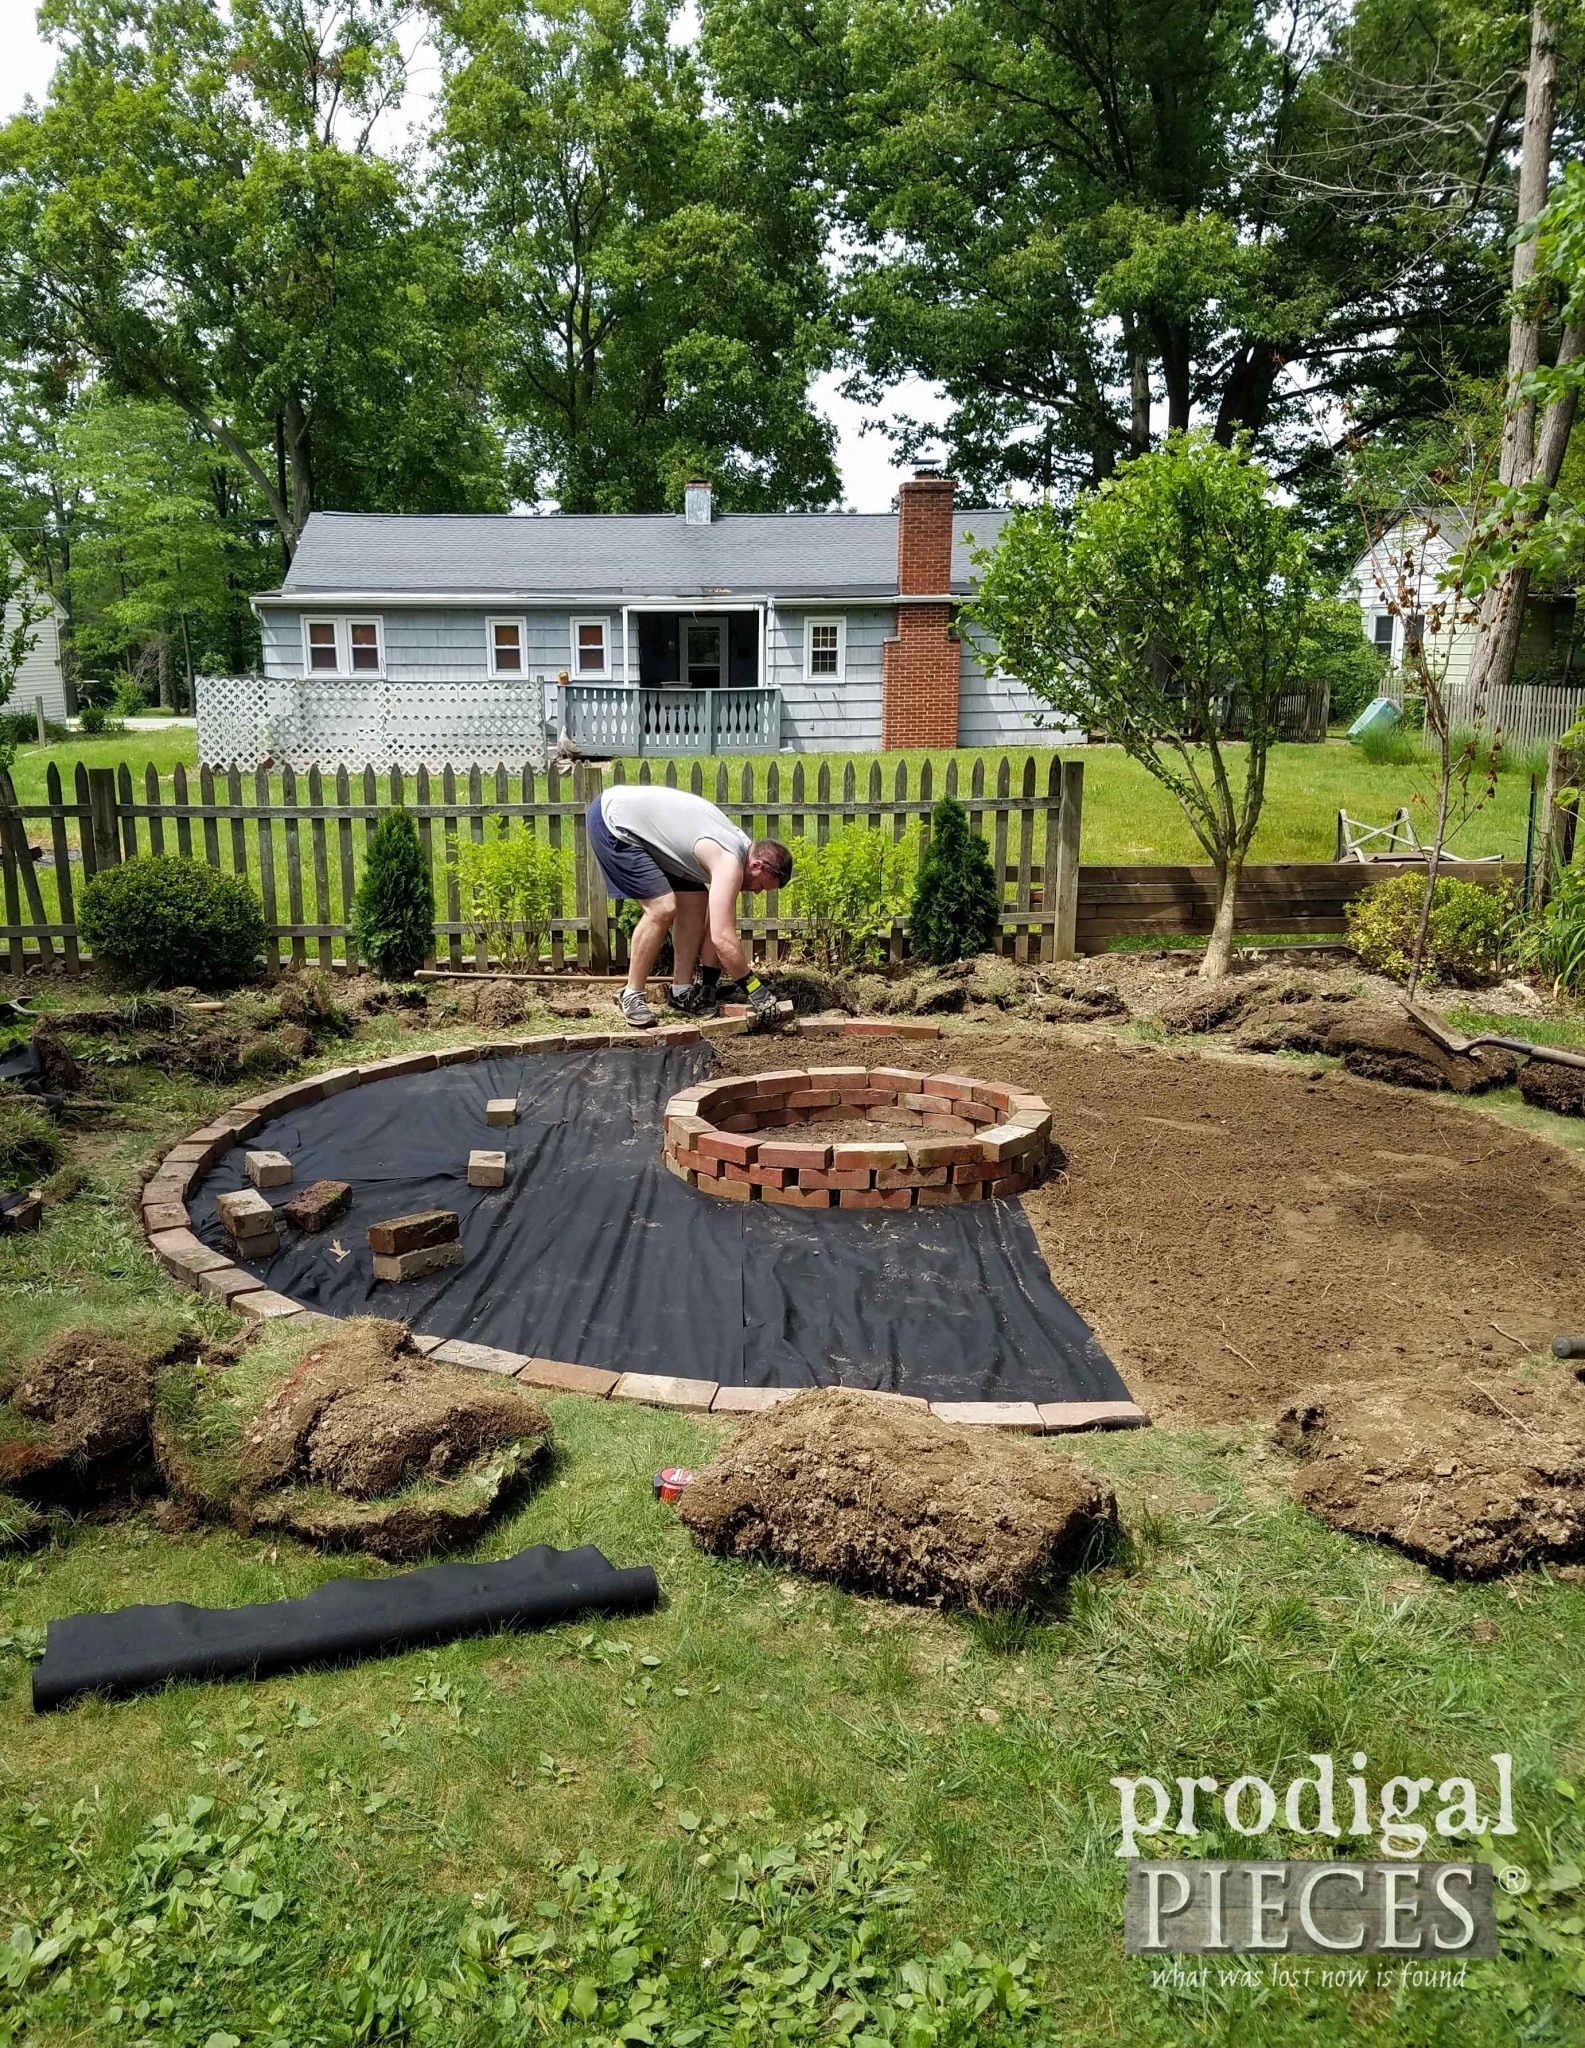 DIY Feuerstelle ~ Backyard Budget Decor - Kinder Blog #budgetbackyard